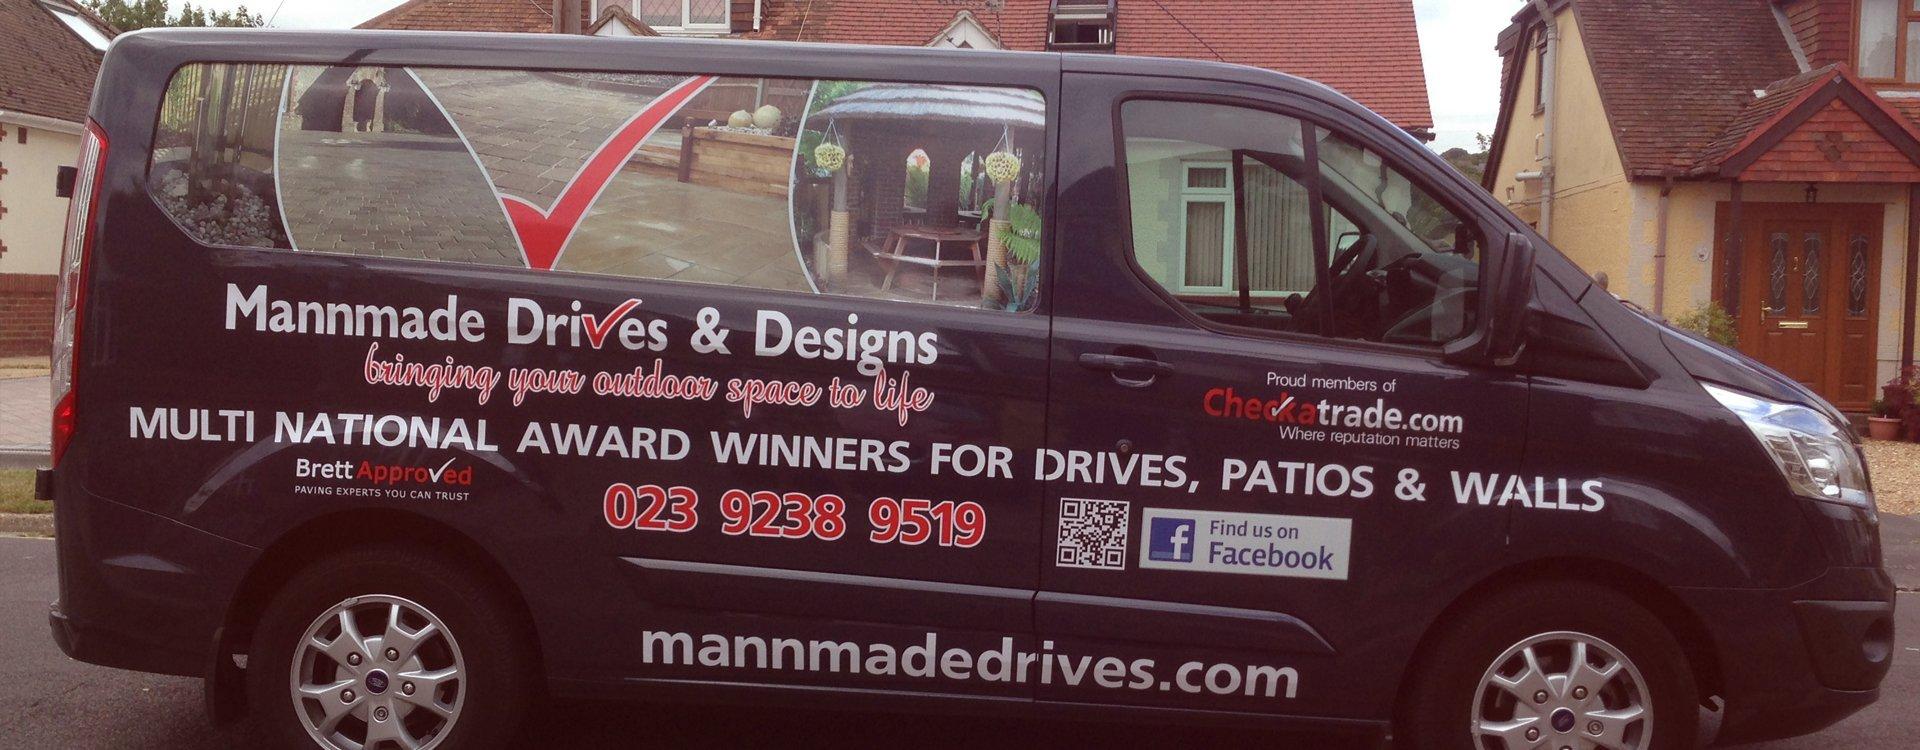 Mannmade Drives & Designs Ltd company van